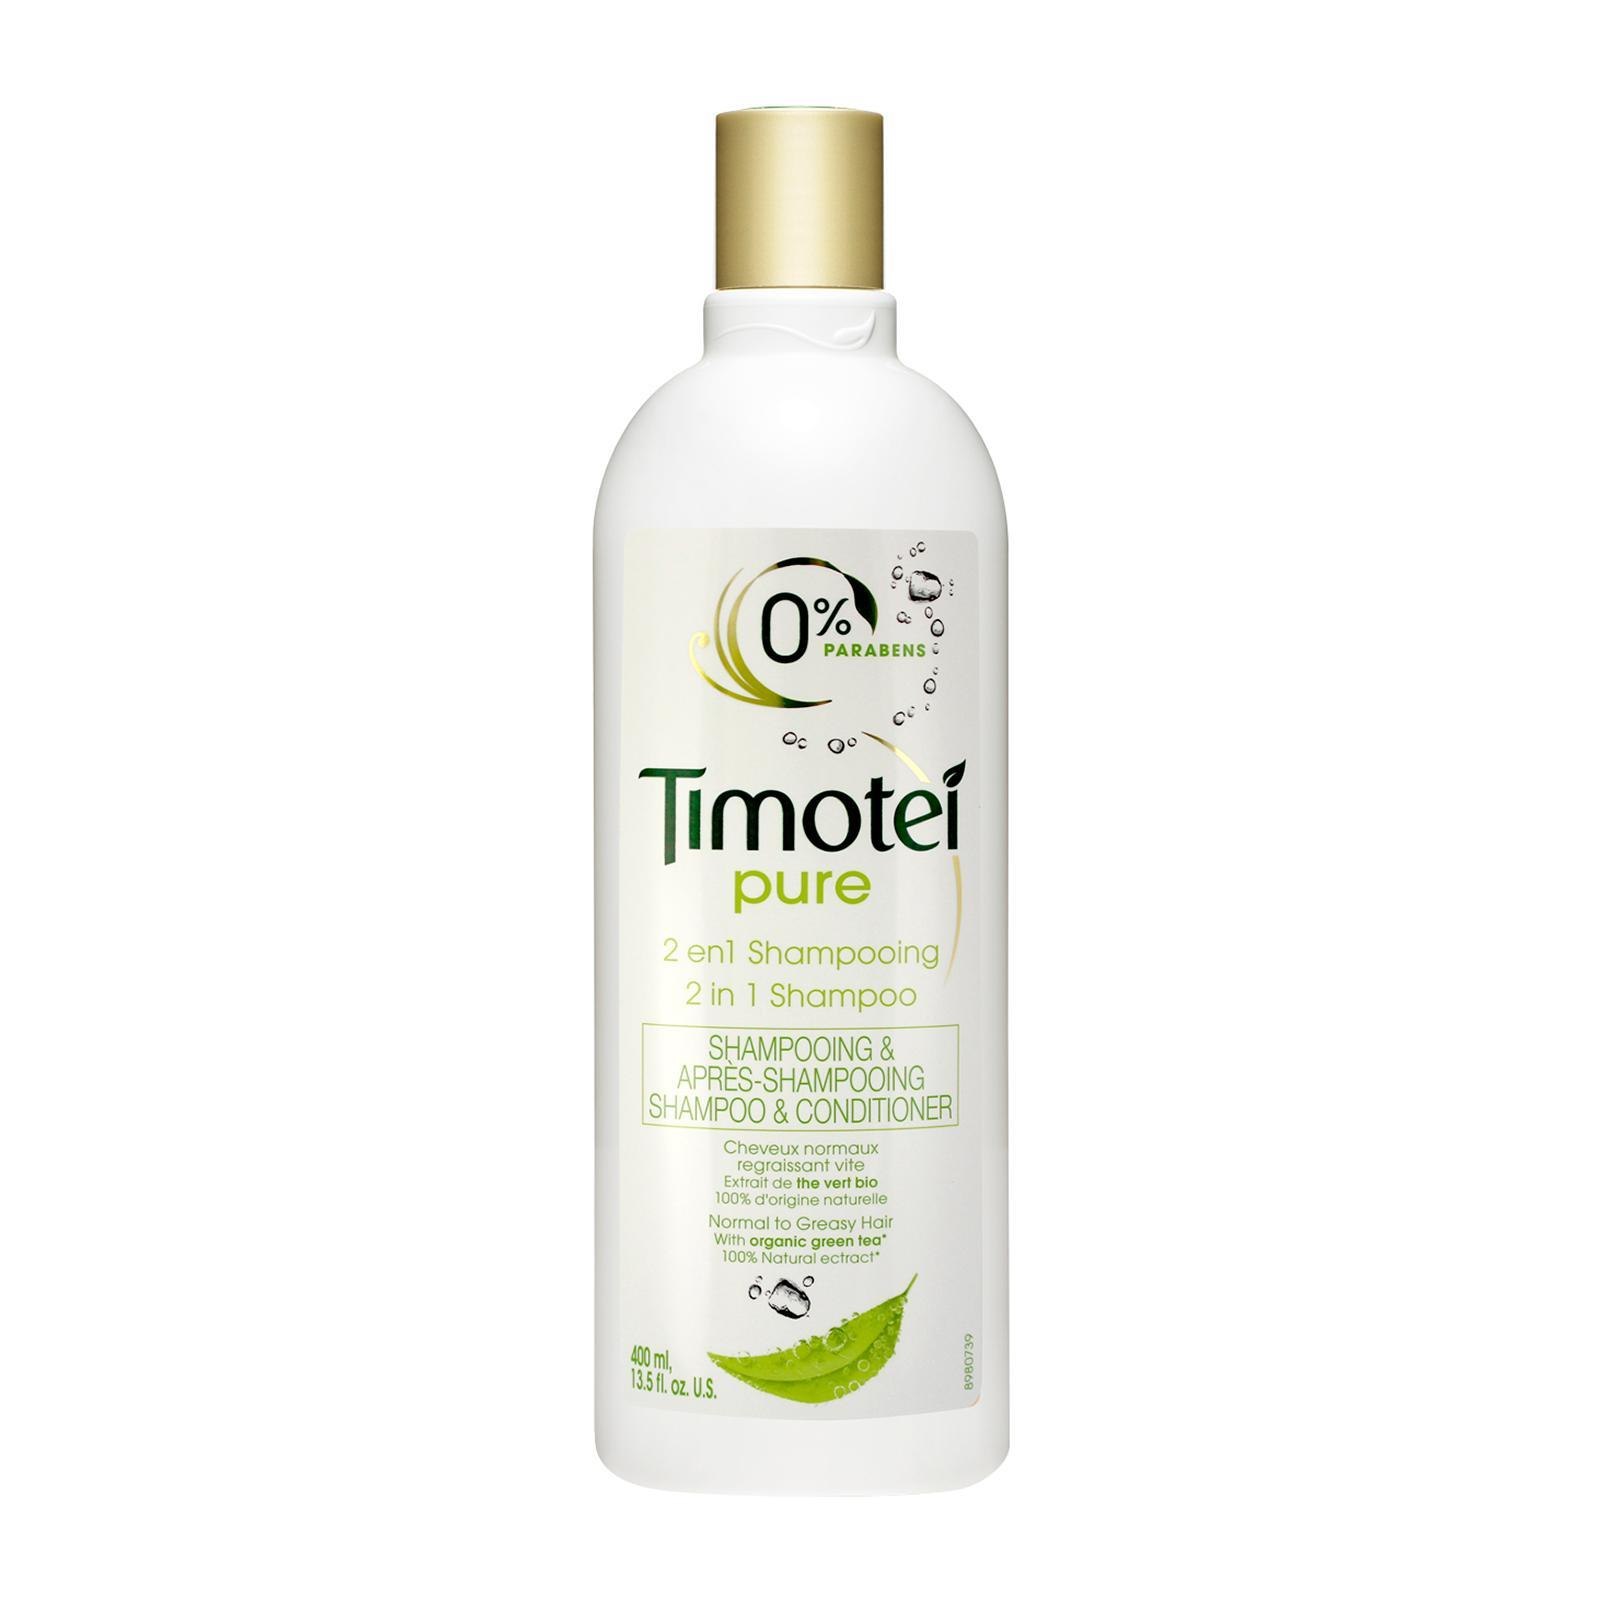 Timotei Pure 2 In 1 Shampoo